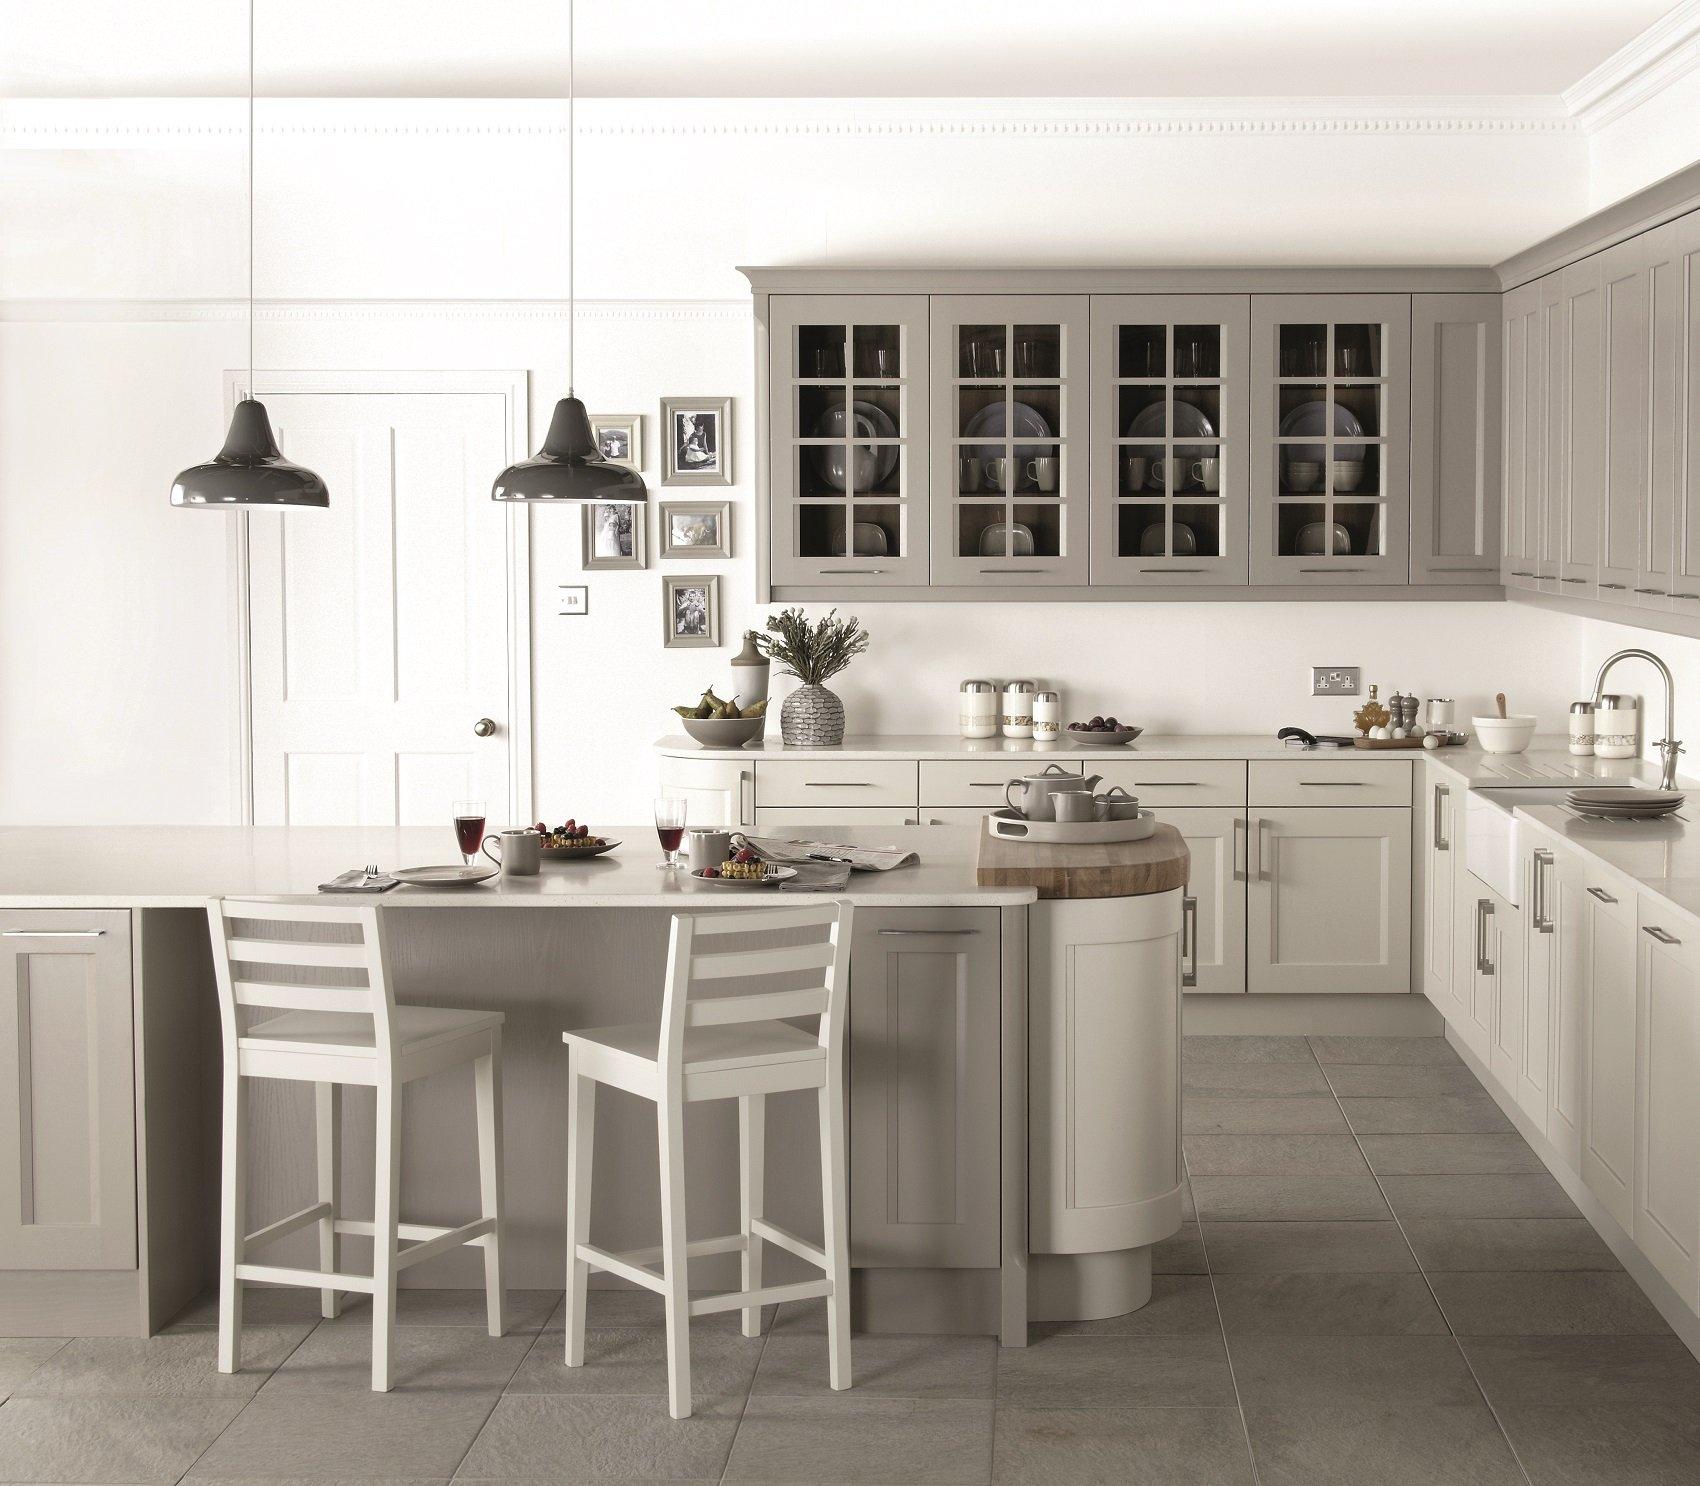 Kitchens Bespoke Tips to plan a new kitchen